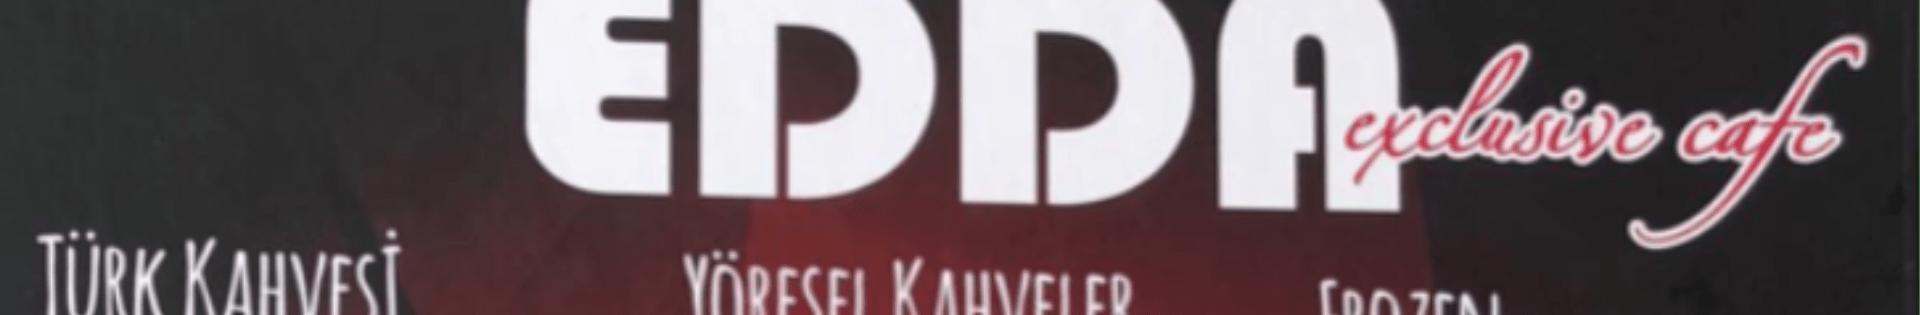 EDDA EXCLUCİVE CAFE & BİSTRO